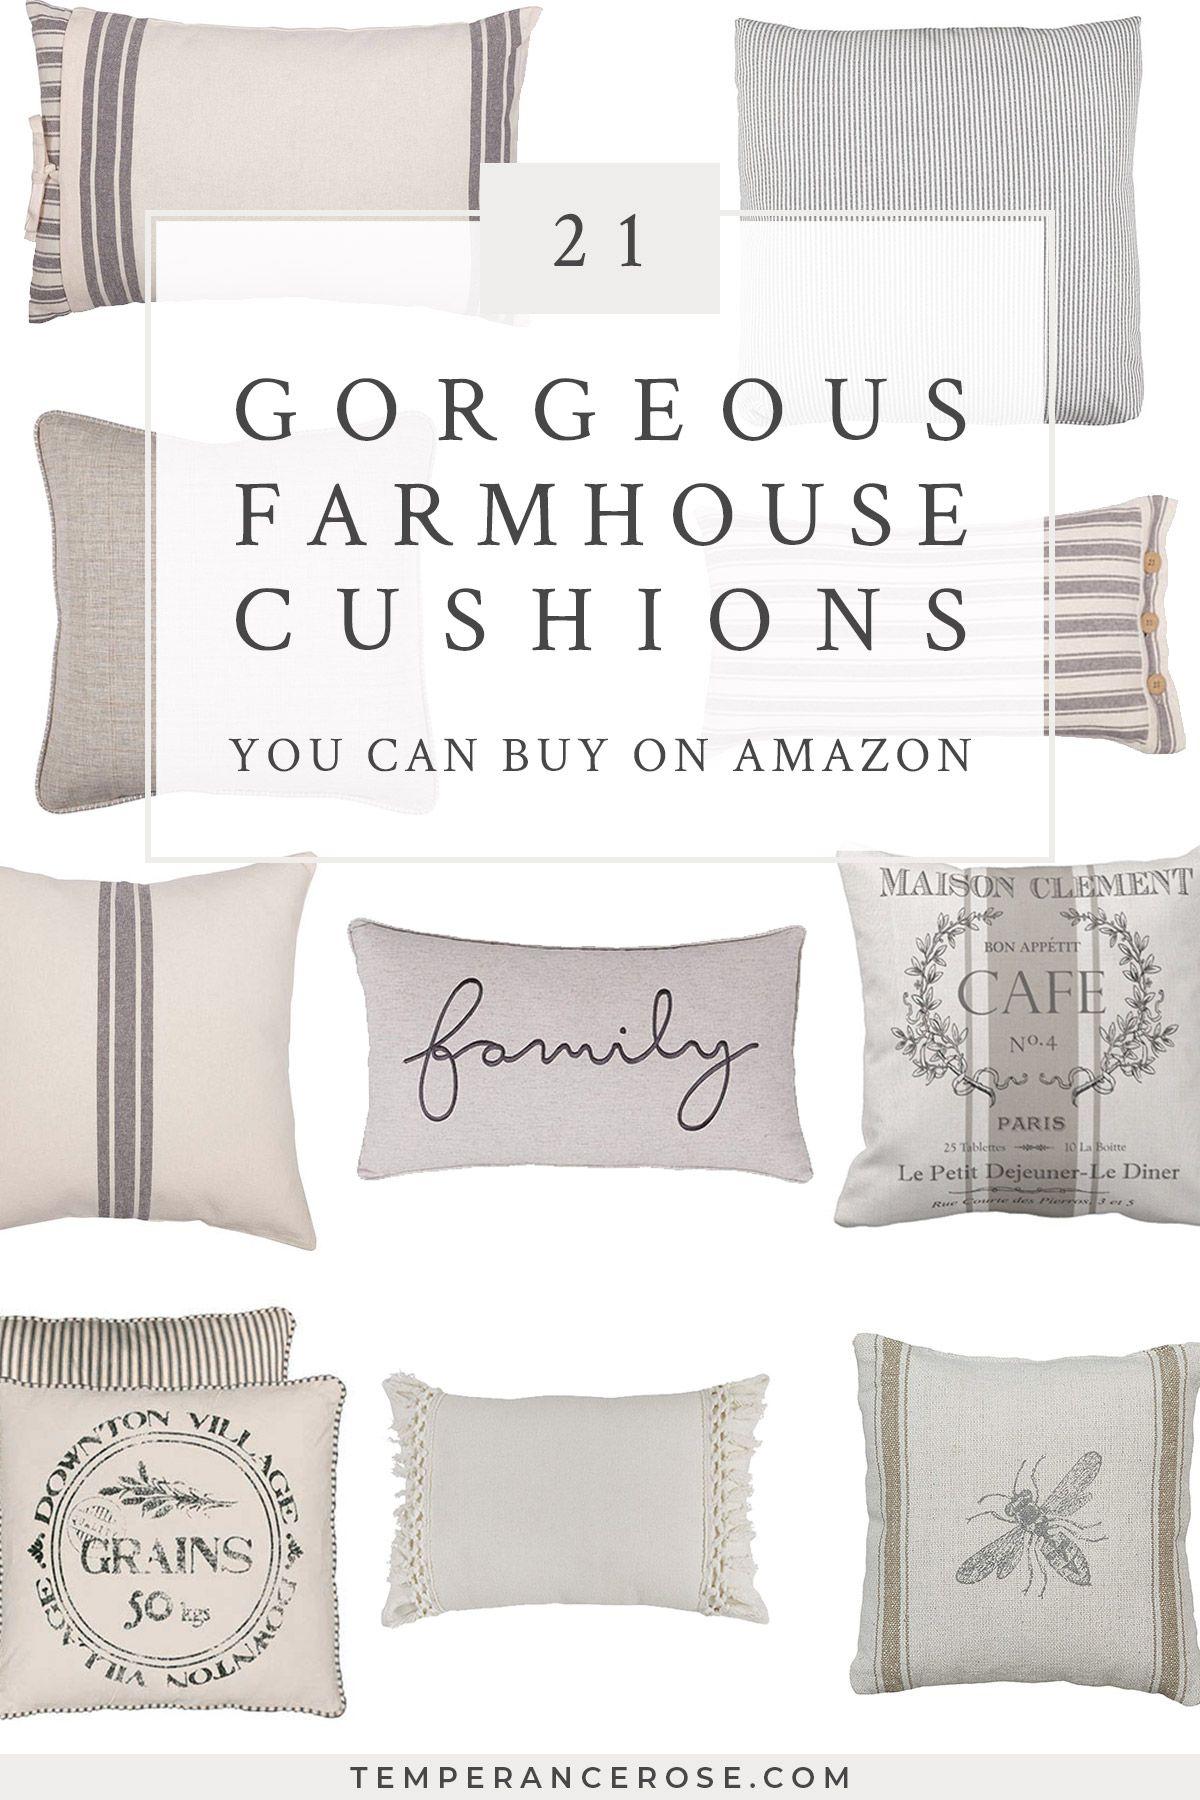 Pretty Farmhouse Throw Pillows You Can Buy On Amazon Farmhouse Throw Pillow Neutral Throw Pillows Amazon Farmhouse Decor